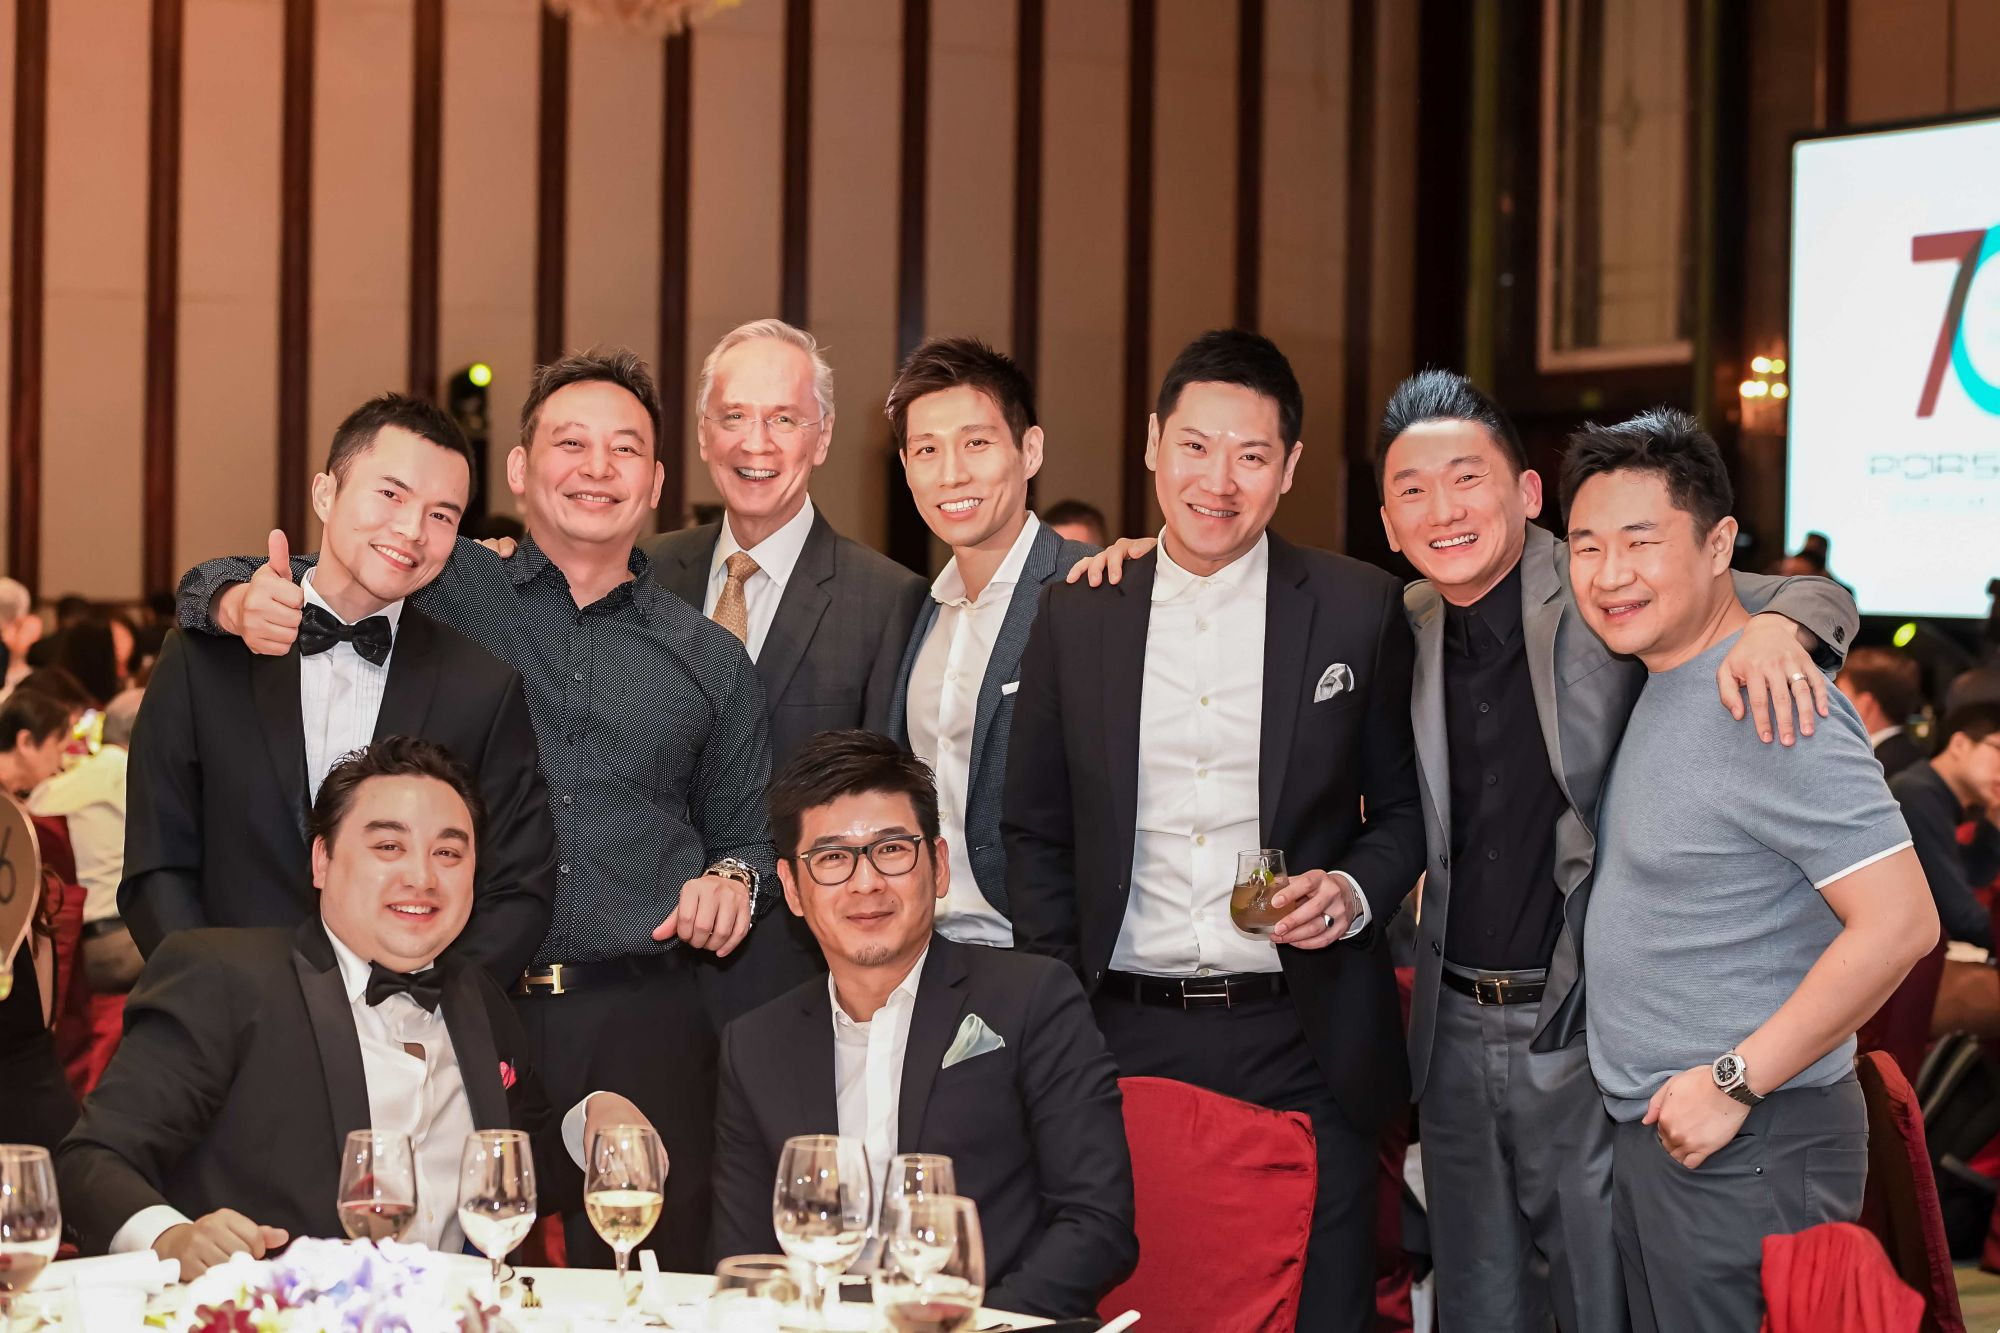 Jim Man Kit, Gavin Sung, Kelvin Liu, Lawrence Chin, Algean Tan, Douglas Chia, Jeremy Soh, Lee Chin Ming, Lim Yi Tee